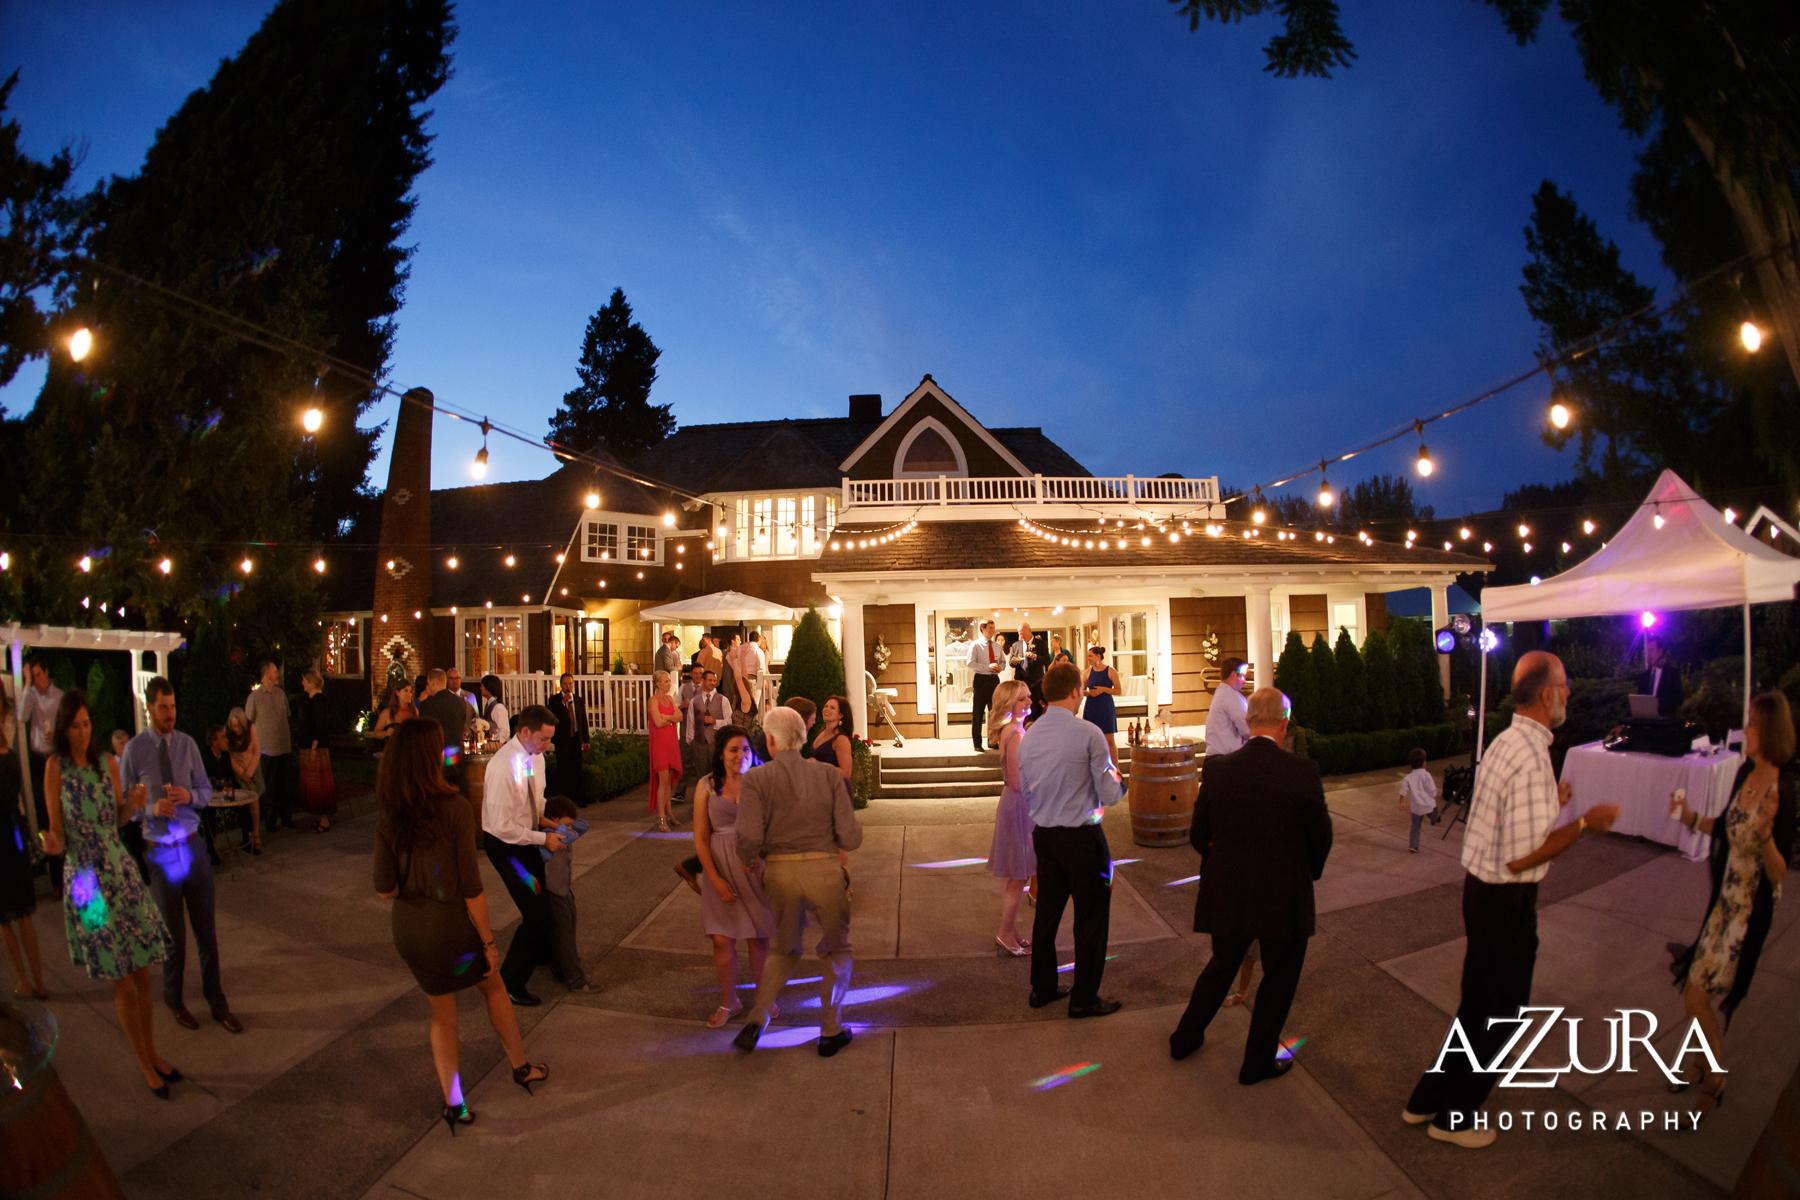 Laurel Creek Manor Wedding in Seattle | Evening dancing at Laurel Creek Manor with Italian cafe lights | Perfectly Posh Events, Seattle Wedding Planner | Azzura Photography